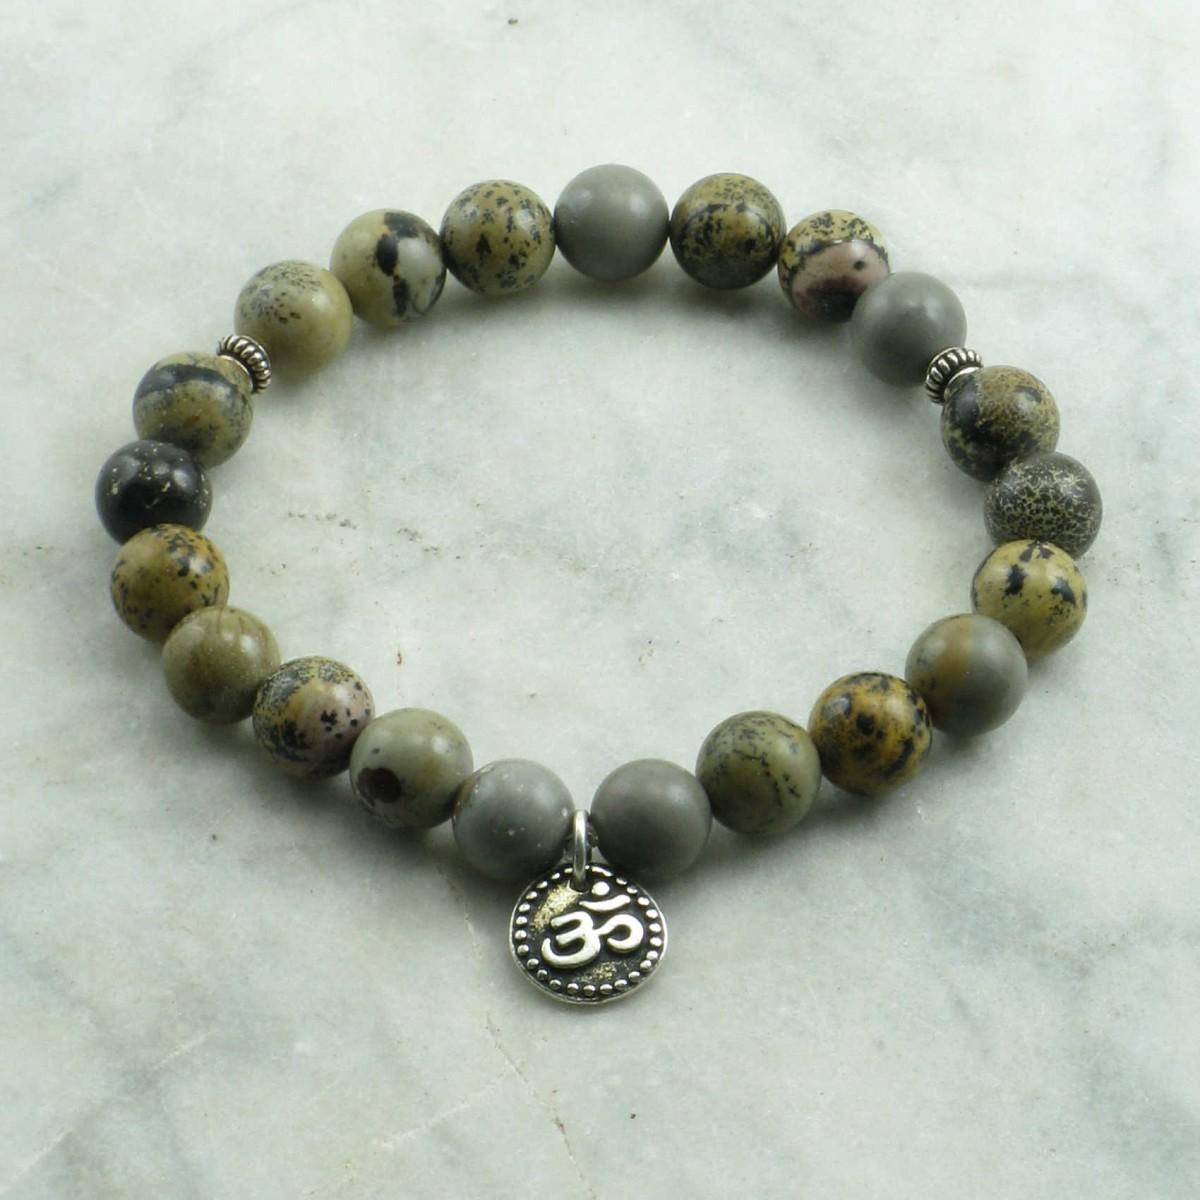 Satsang_Mala_Bracelet_21_Artistic_Stone_Mala_Beads_Buddhist_Bracelet